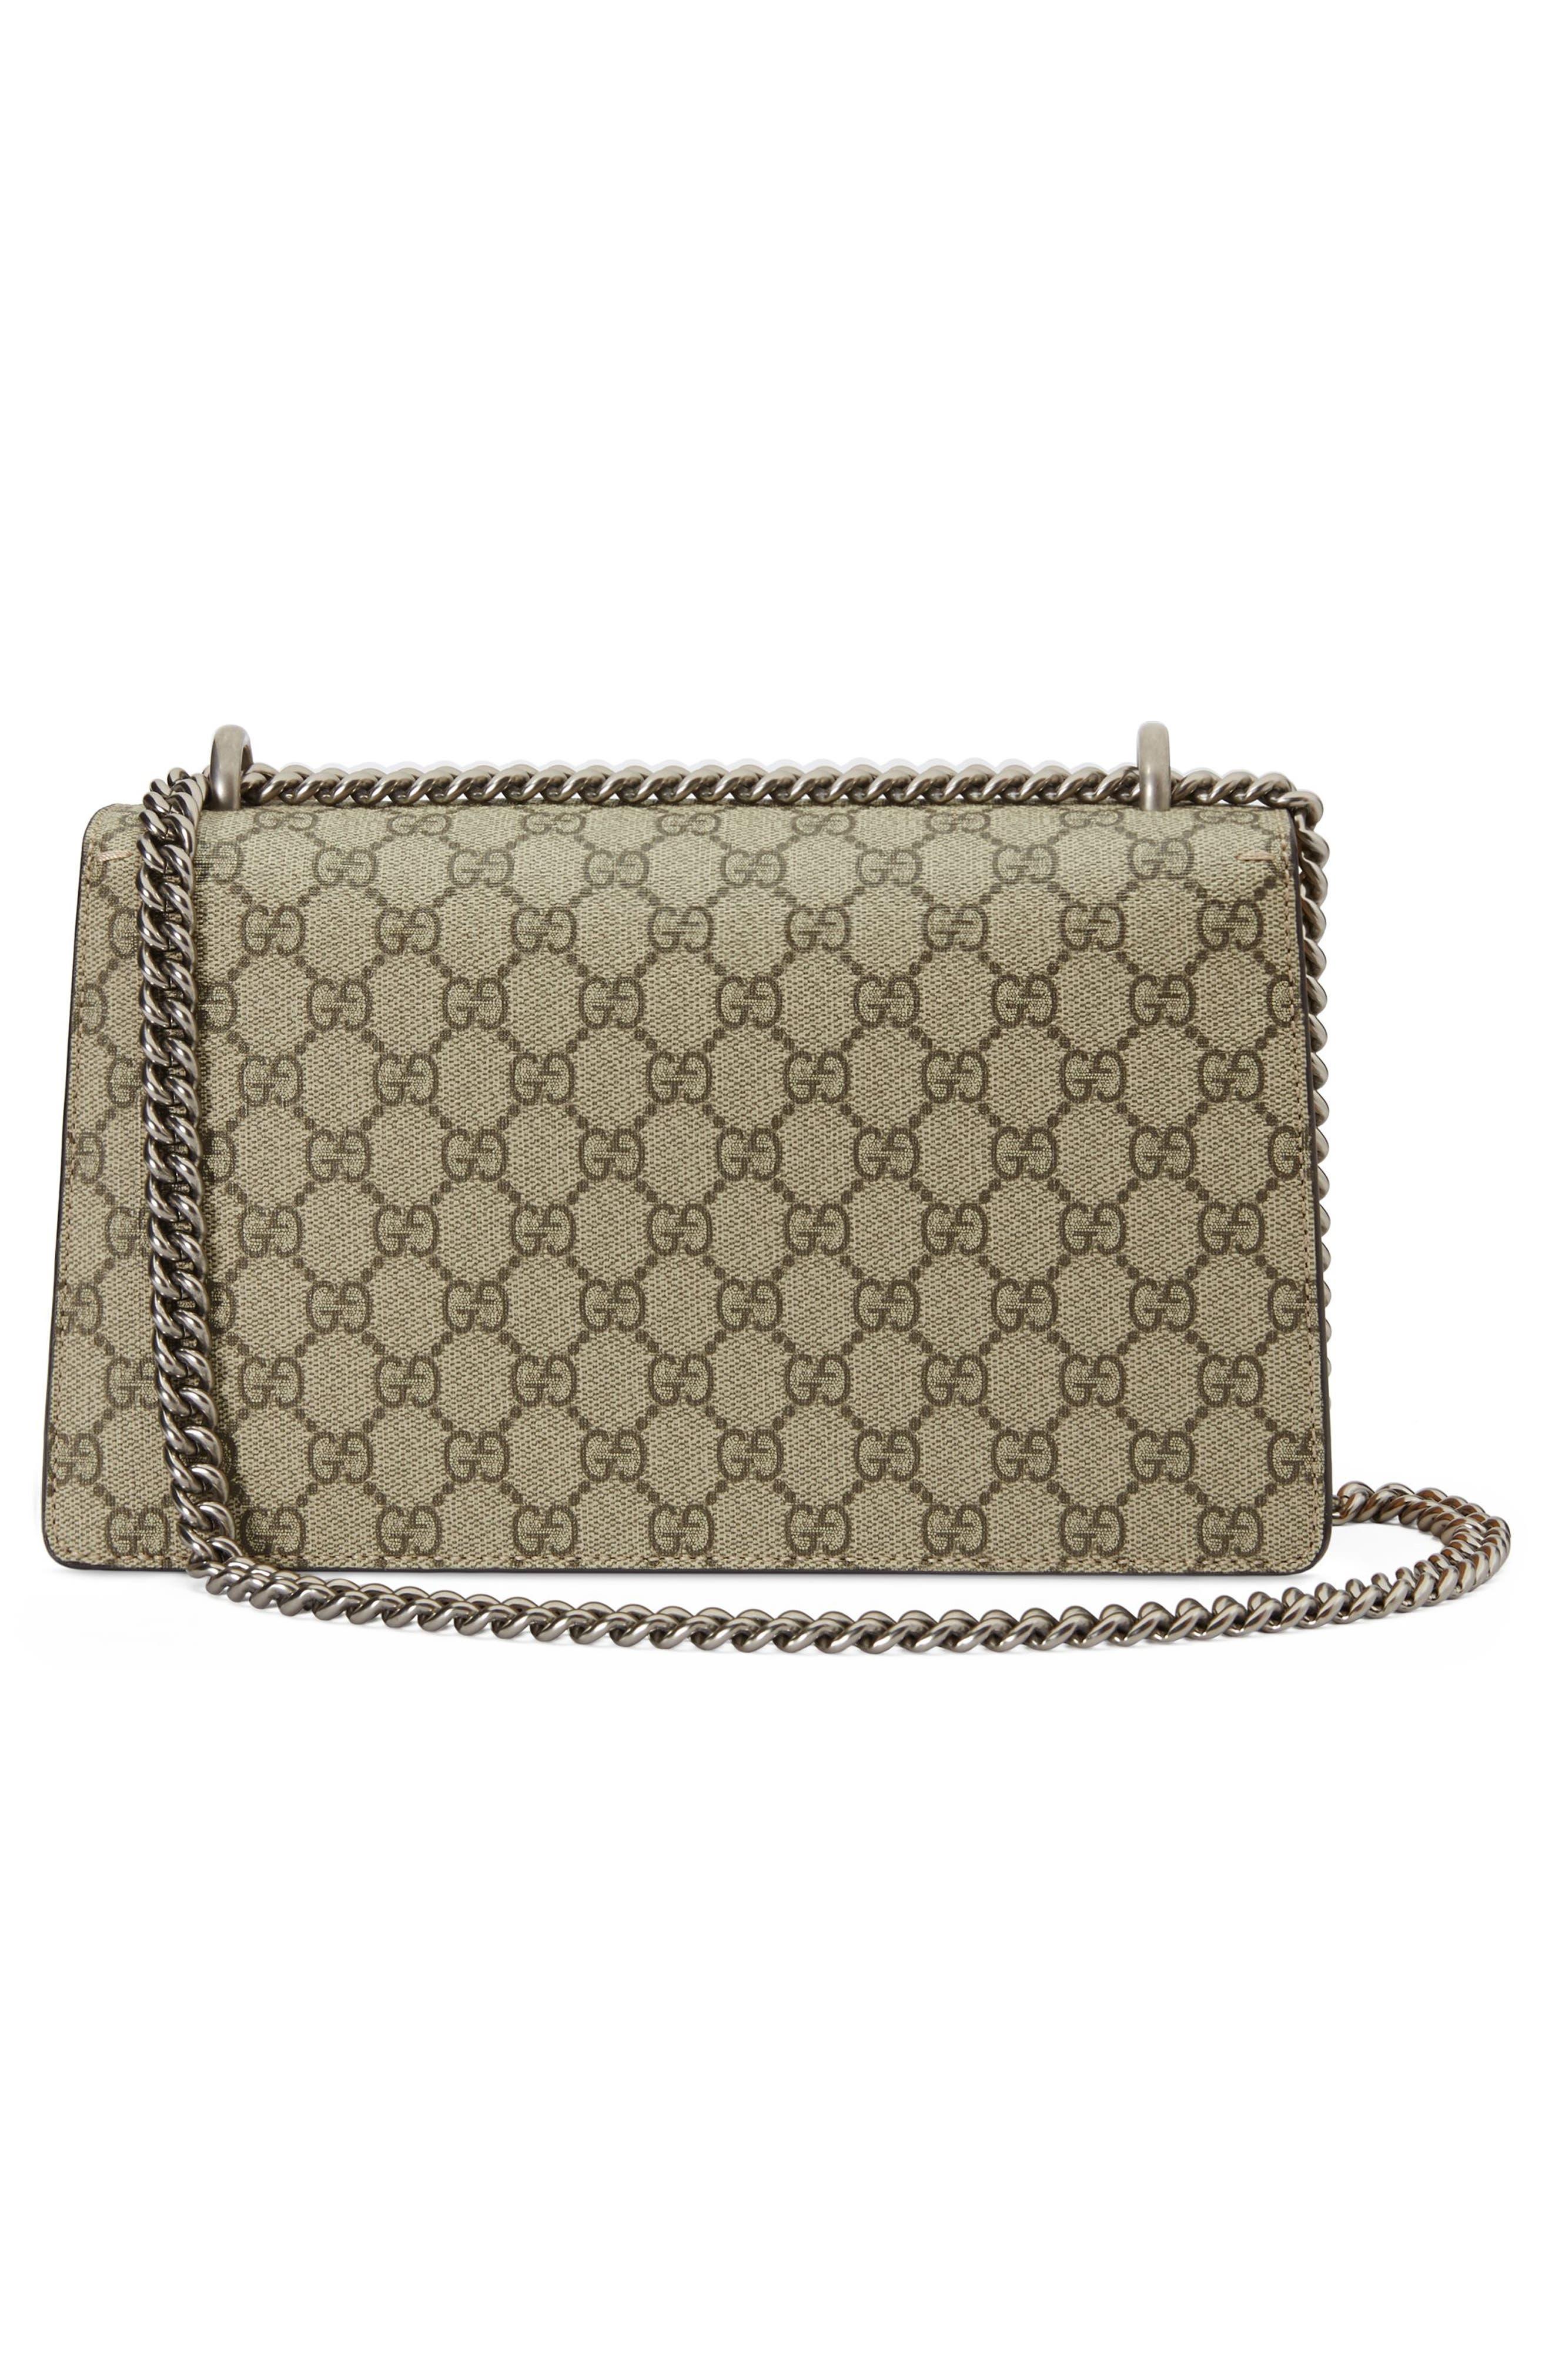 Small Dionysus Embellished GG Supreme & Genuine Python Shoulder Bag,                             Alternate thumbnail 2, color,                             BEIGE EBONY/ VIPER YELLOW